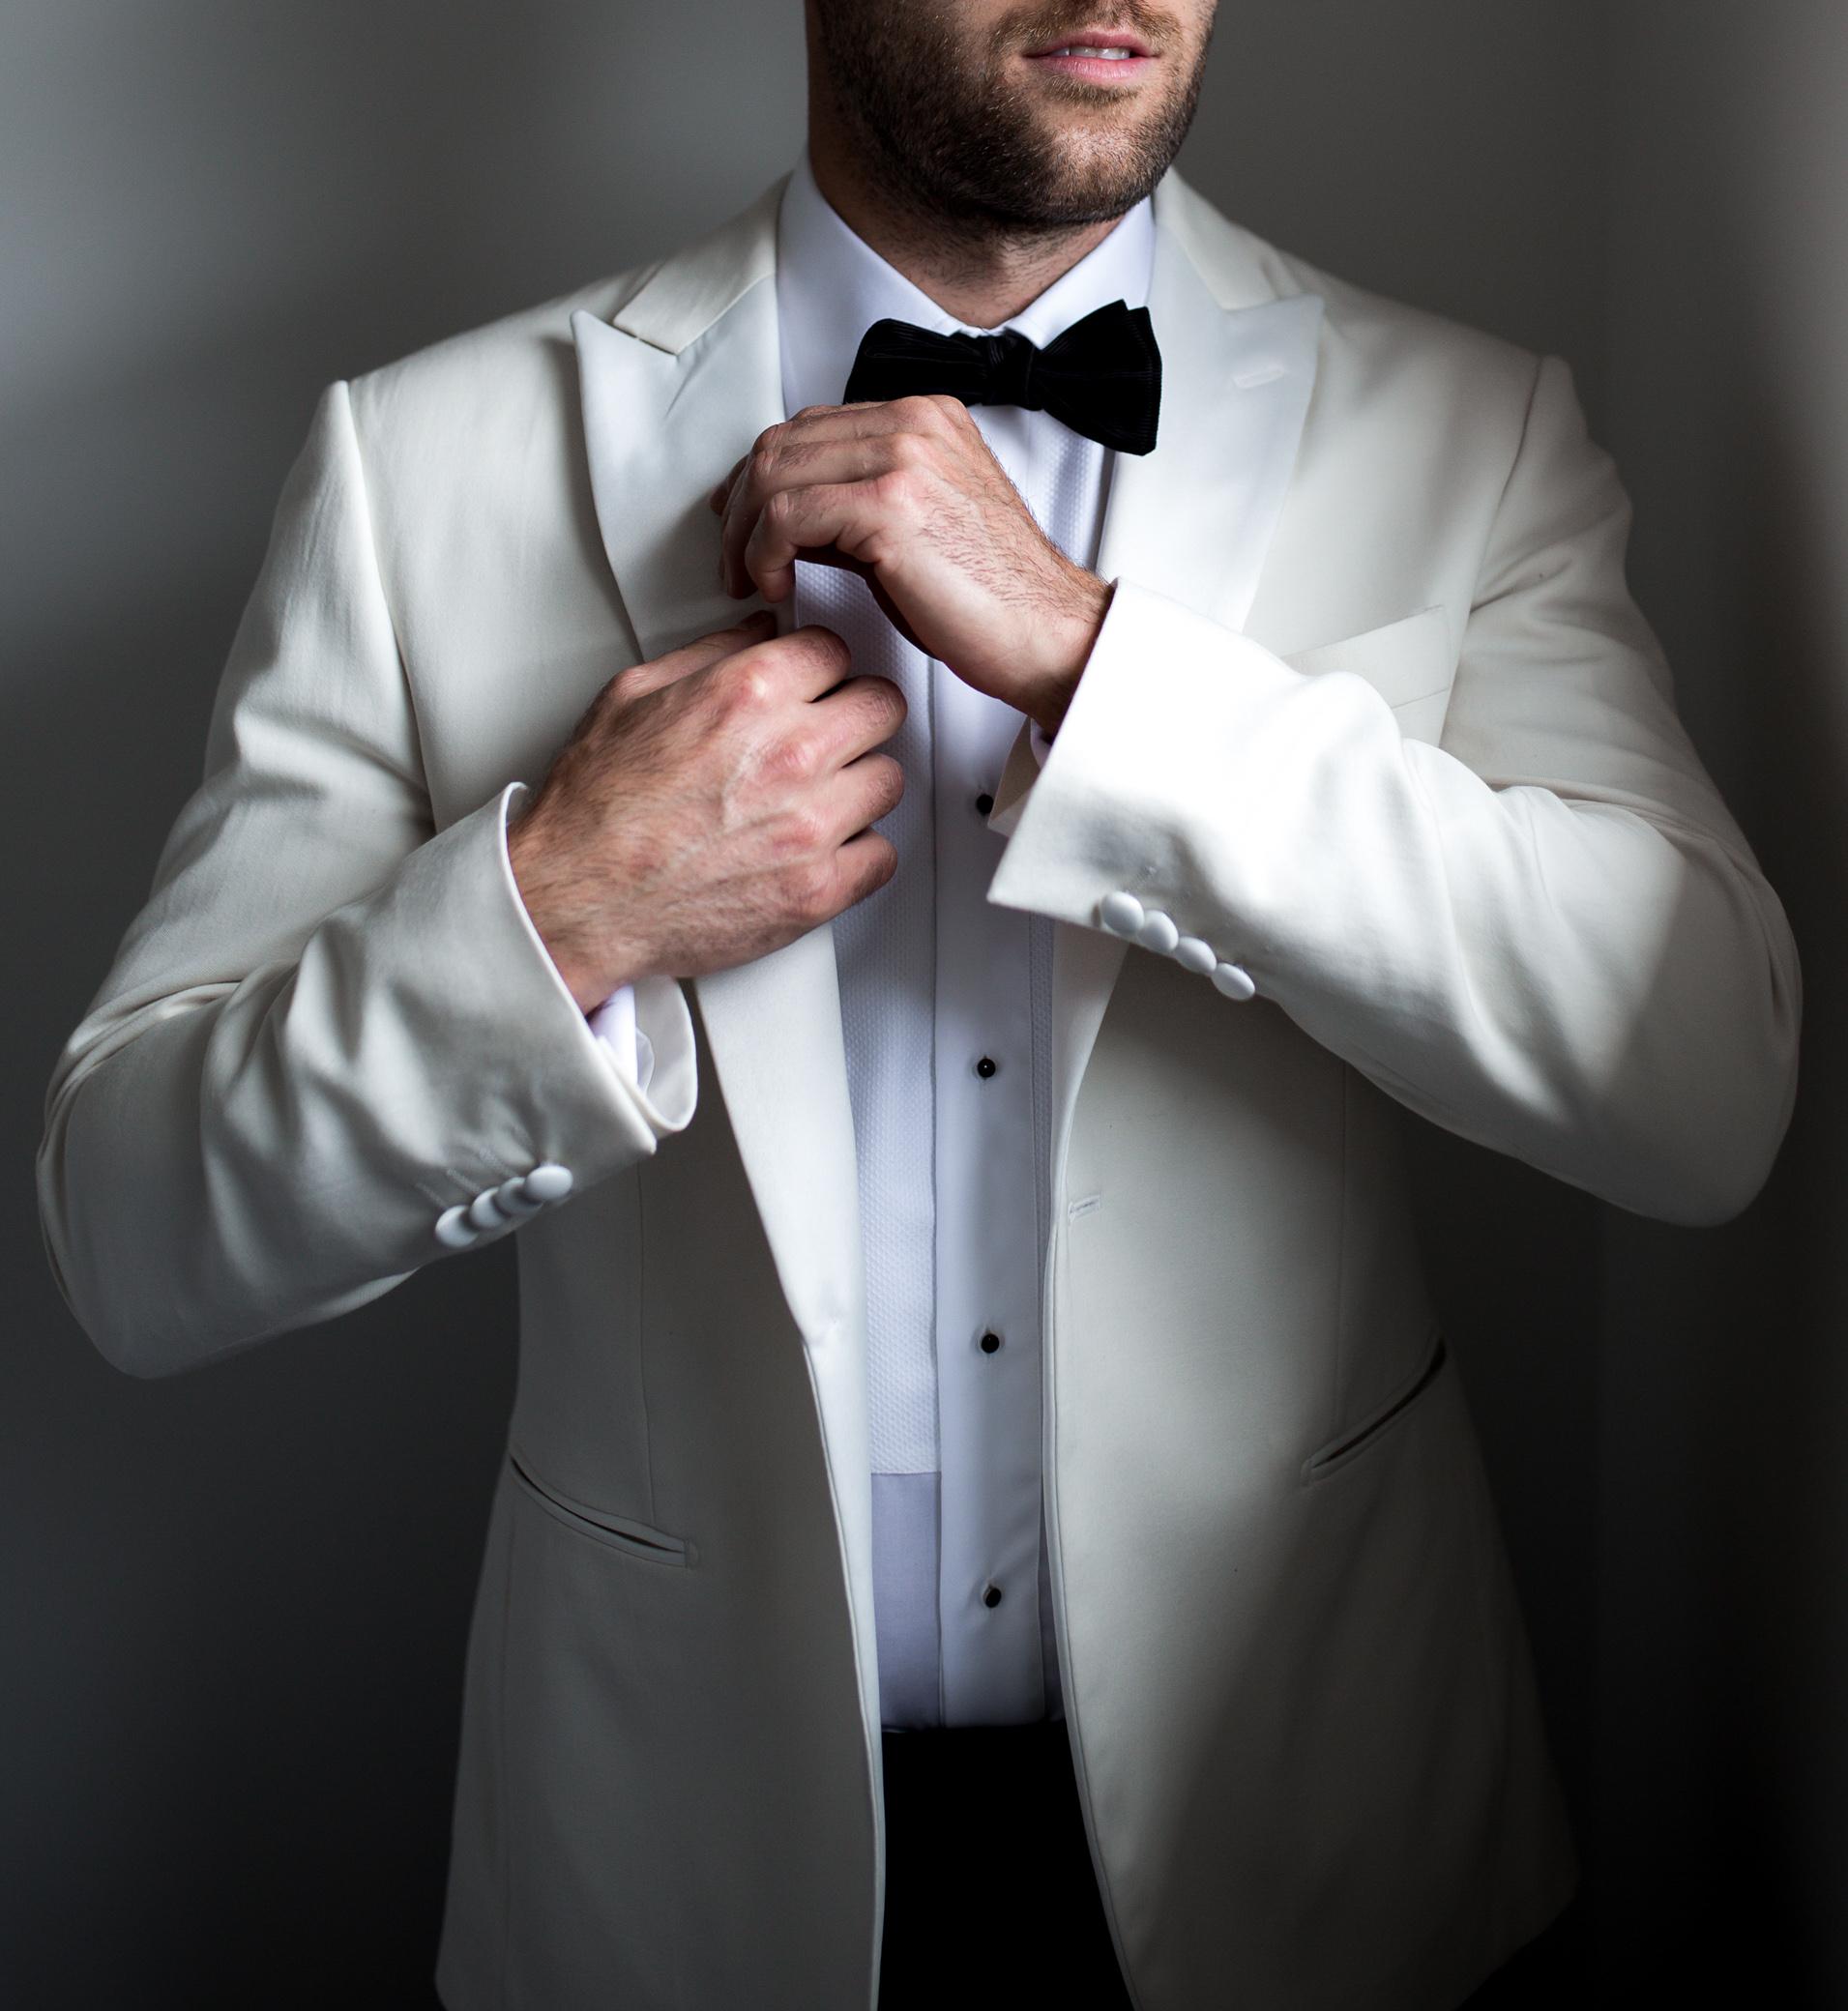 mr-theodore_white-vine-photography_same-sex-wedding-directory8.jpg